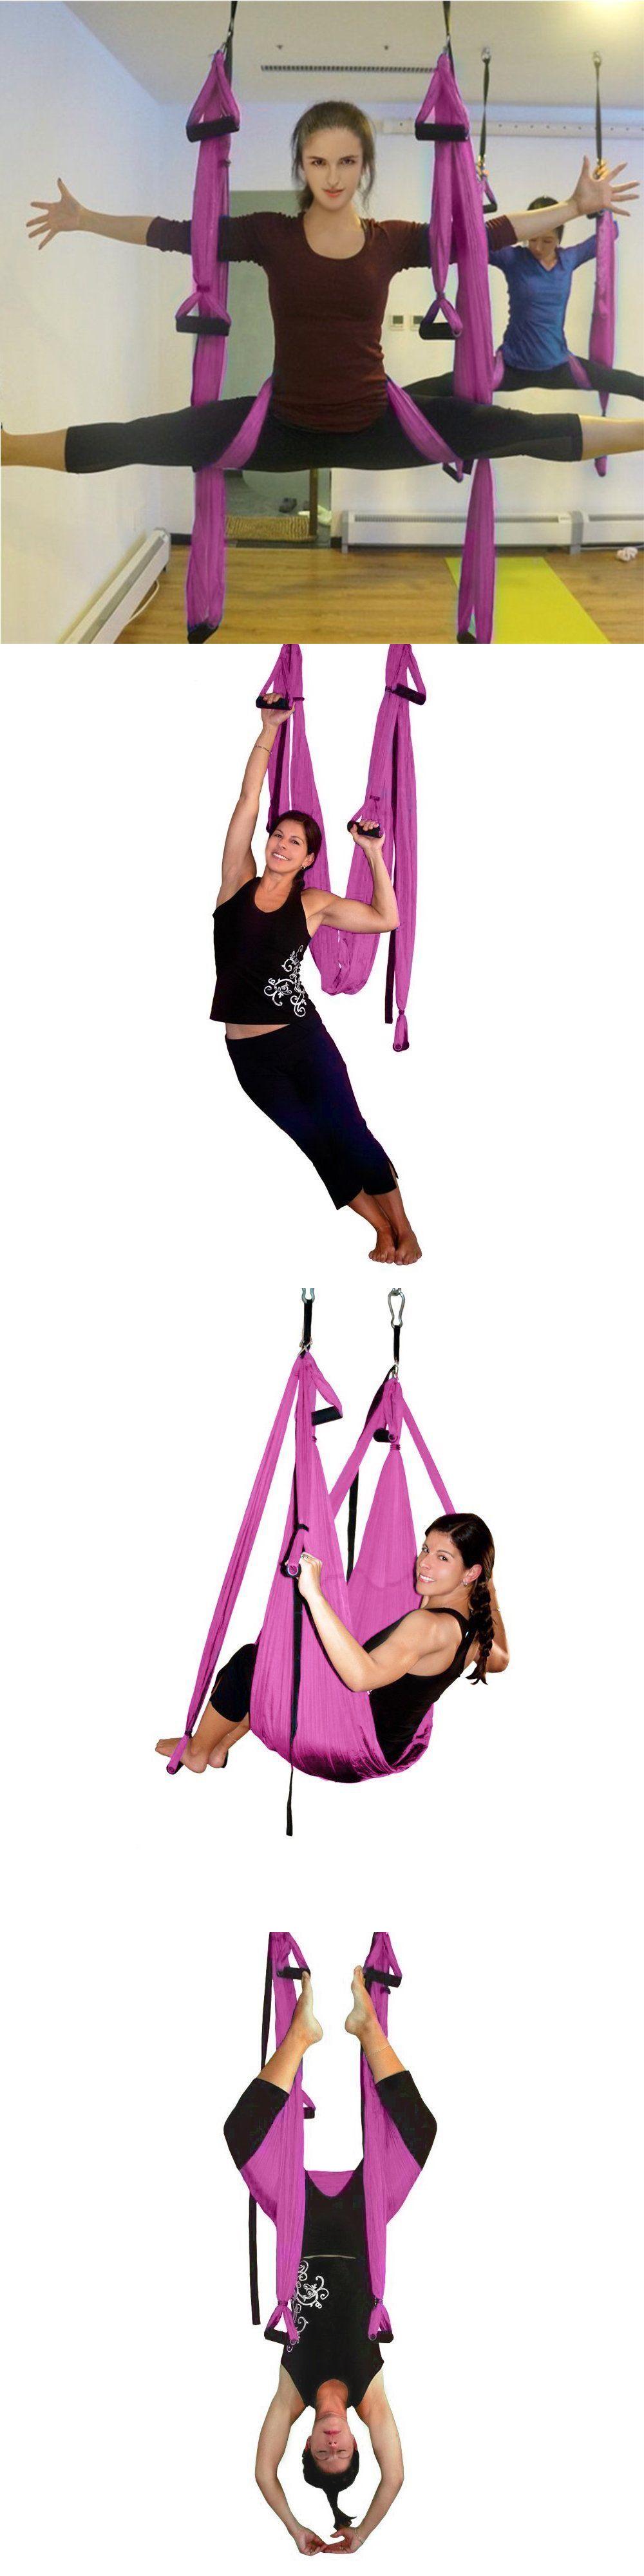 Yoga props aerial yoga swing equipment flying hammock sling